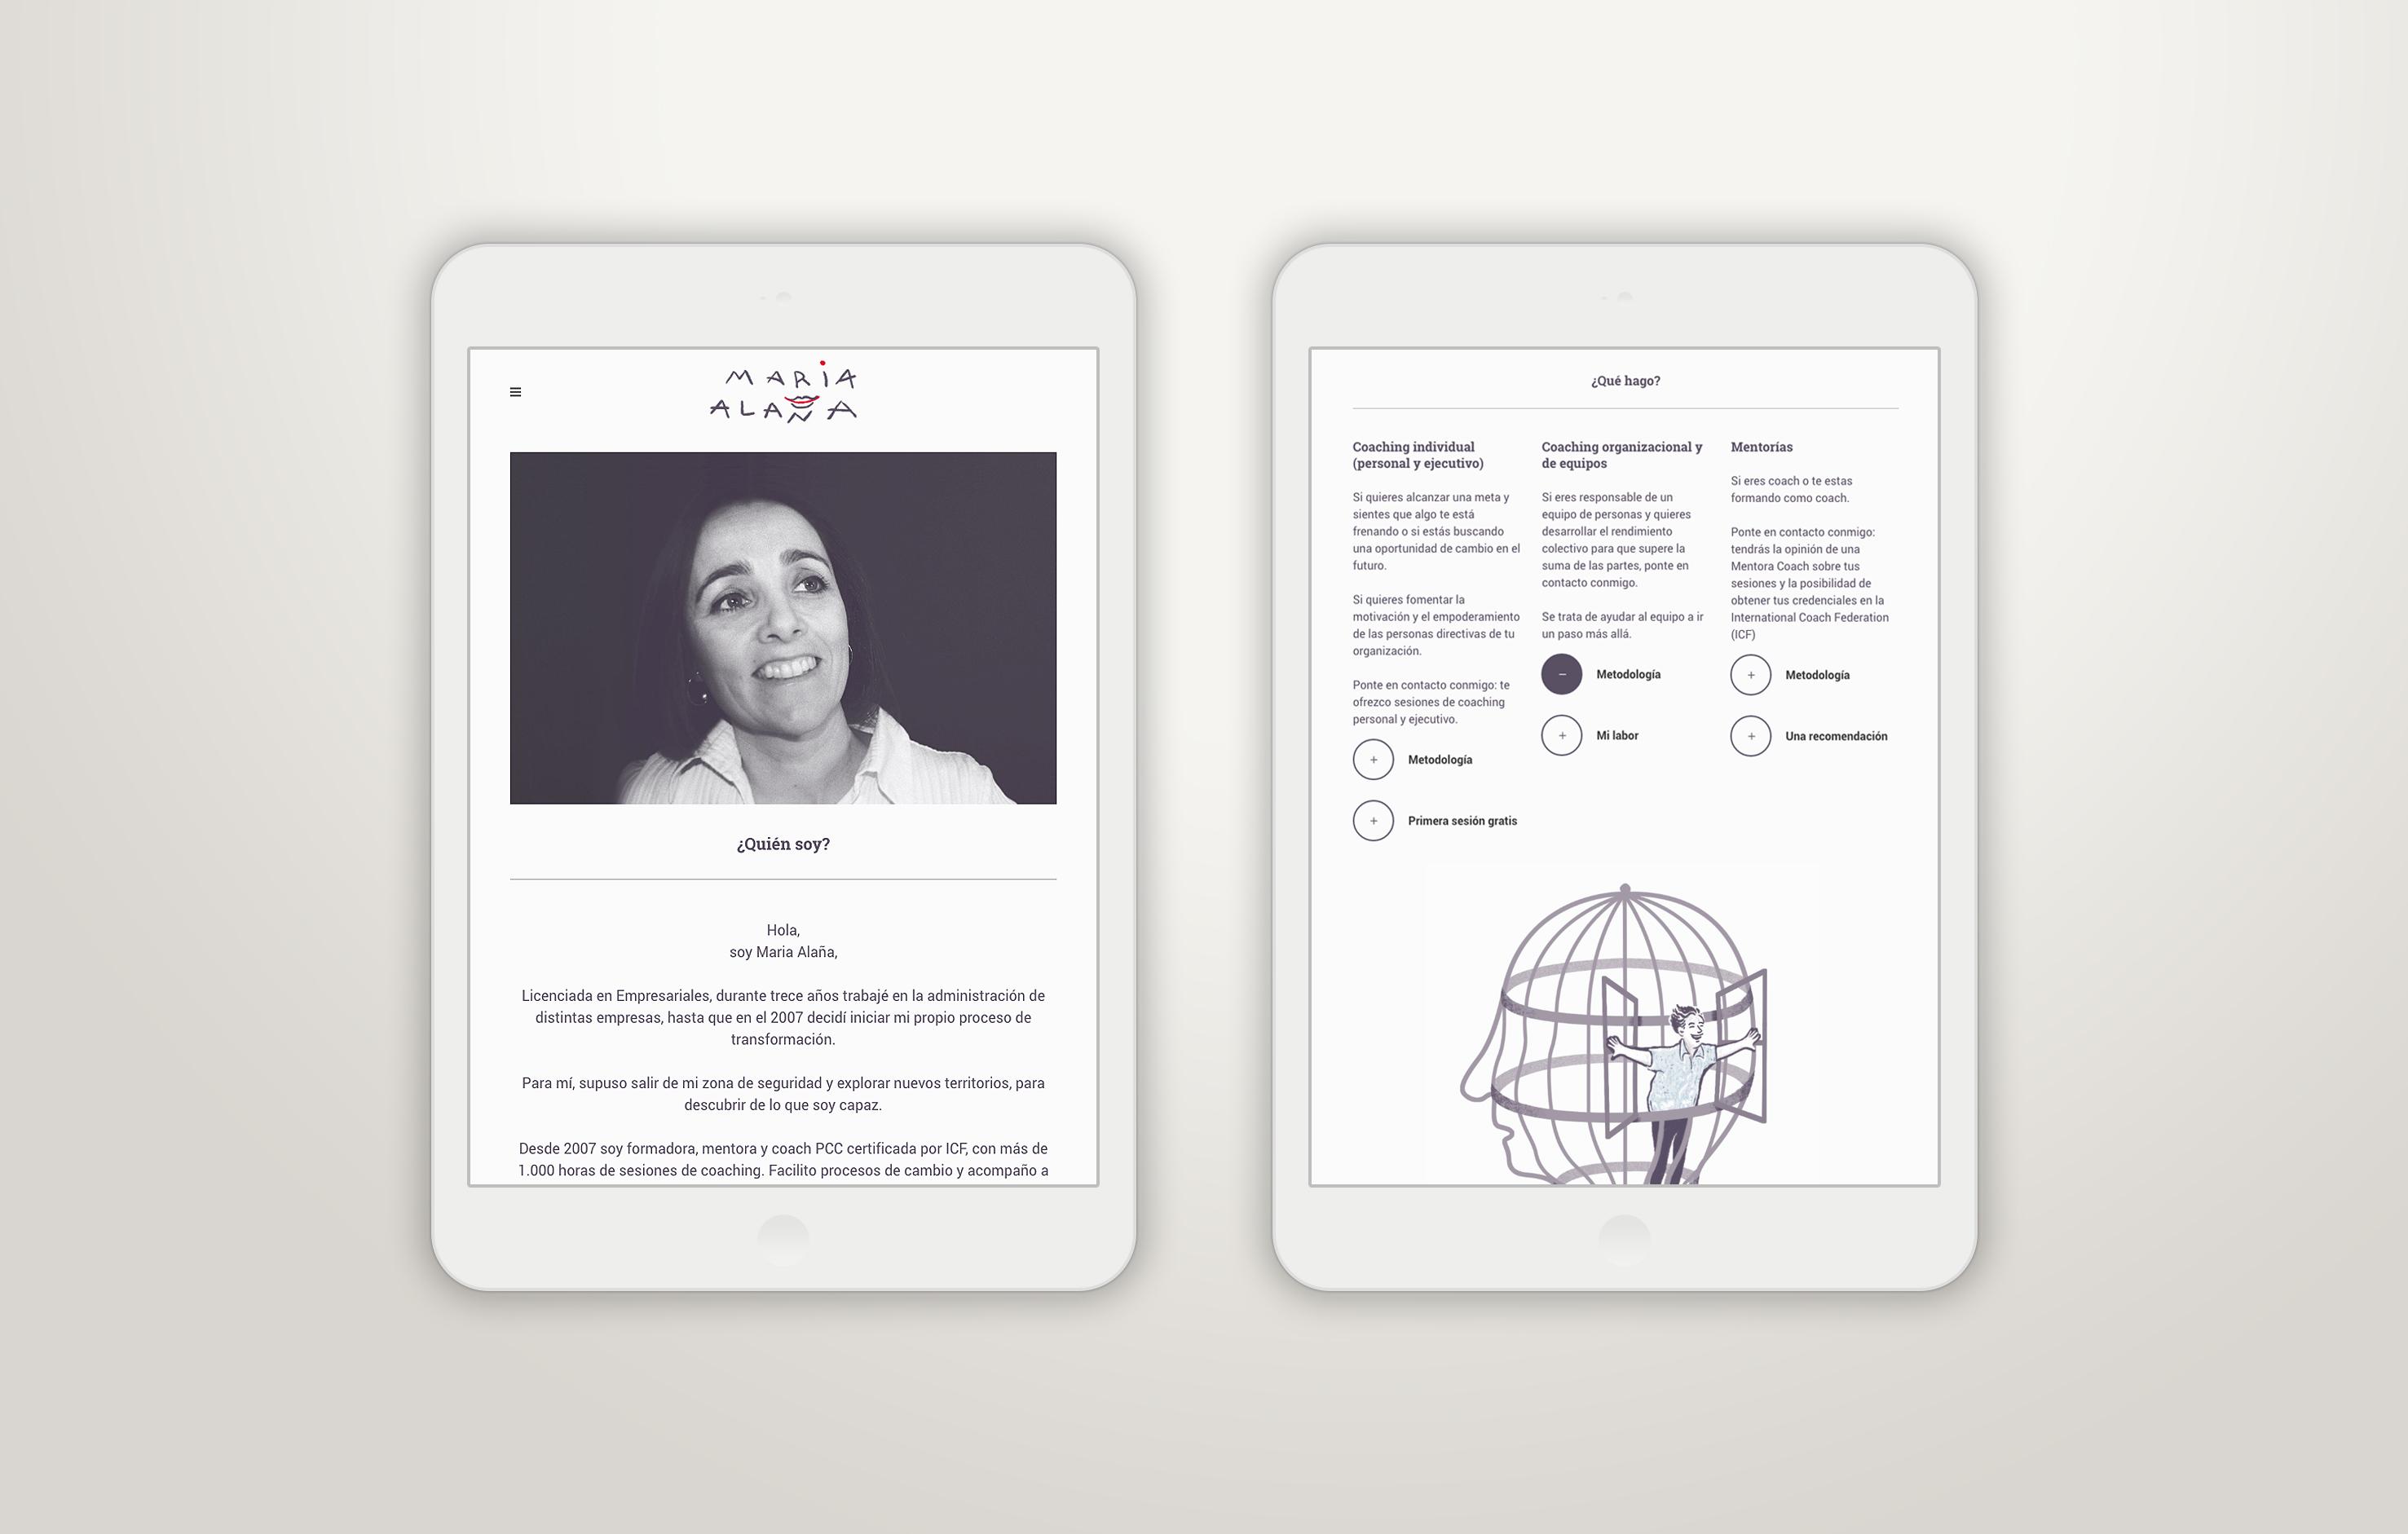 Web Maria Alaña, coach by Nagore M. Jauregi - Creative Work - $i